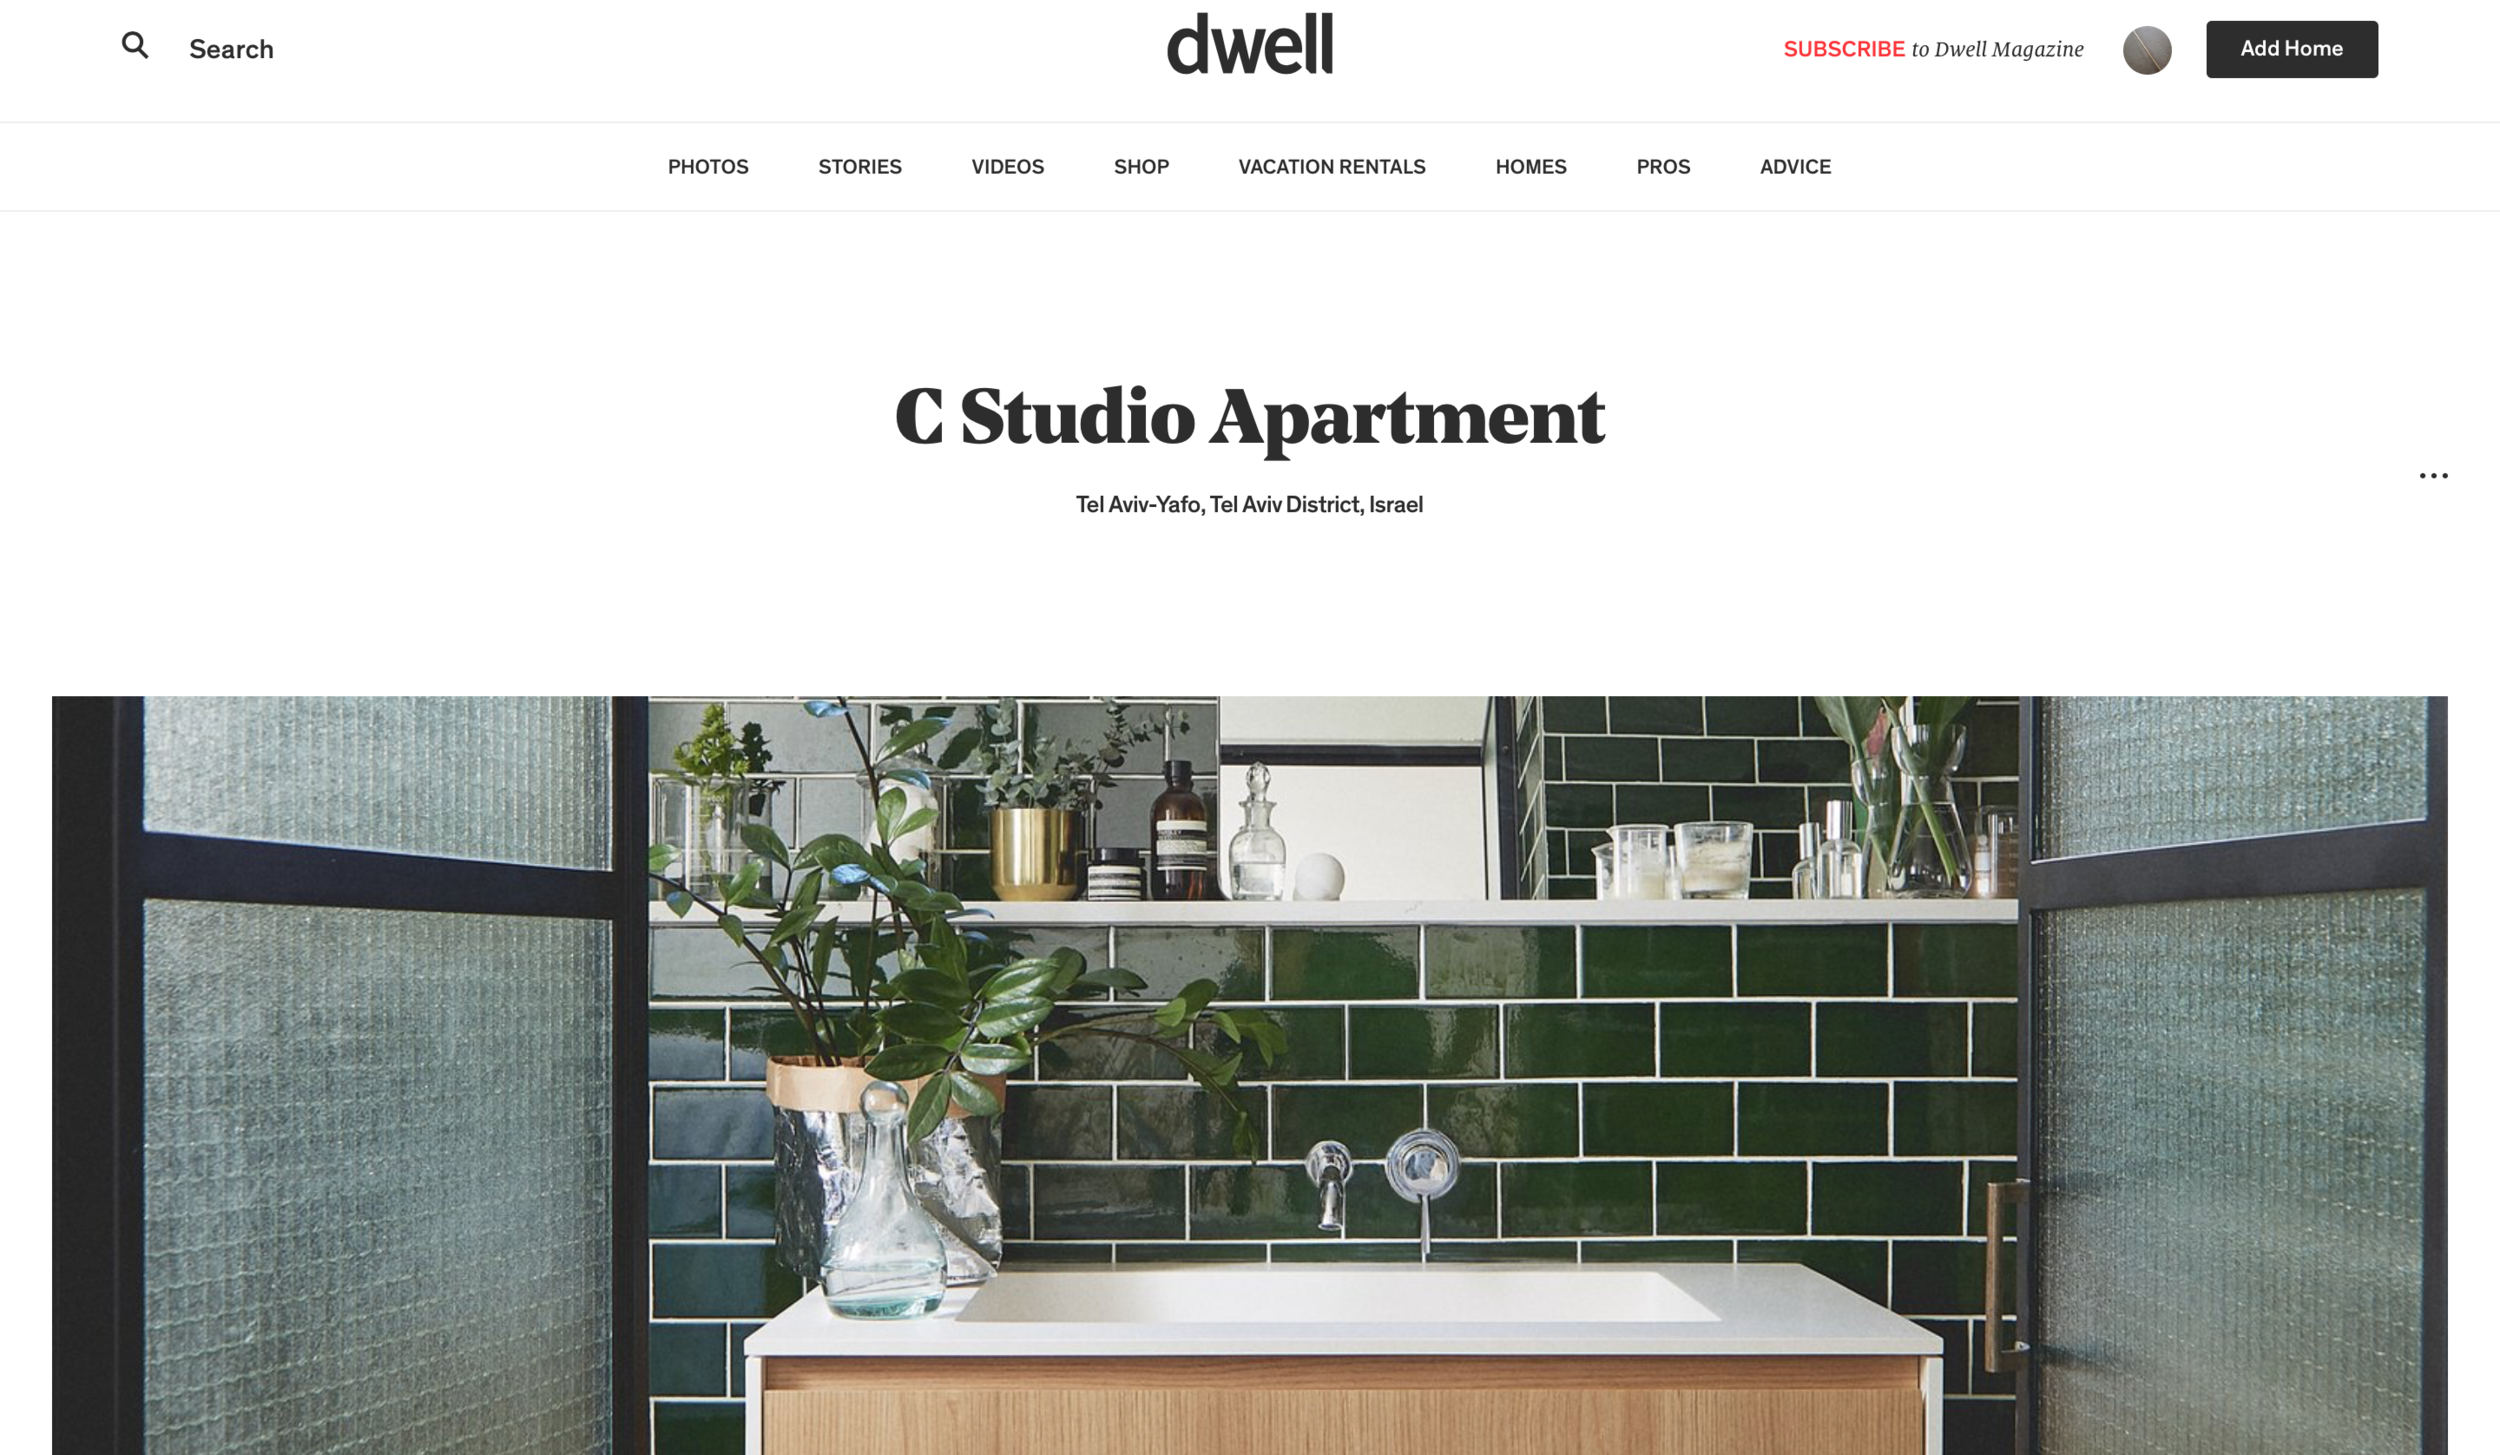 Dwell.com